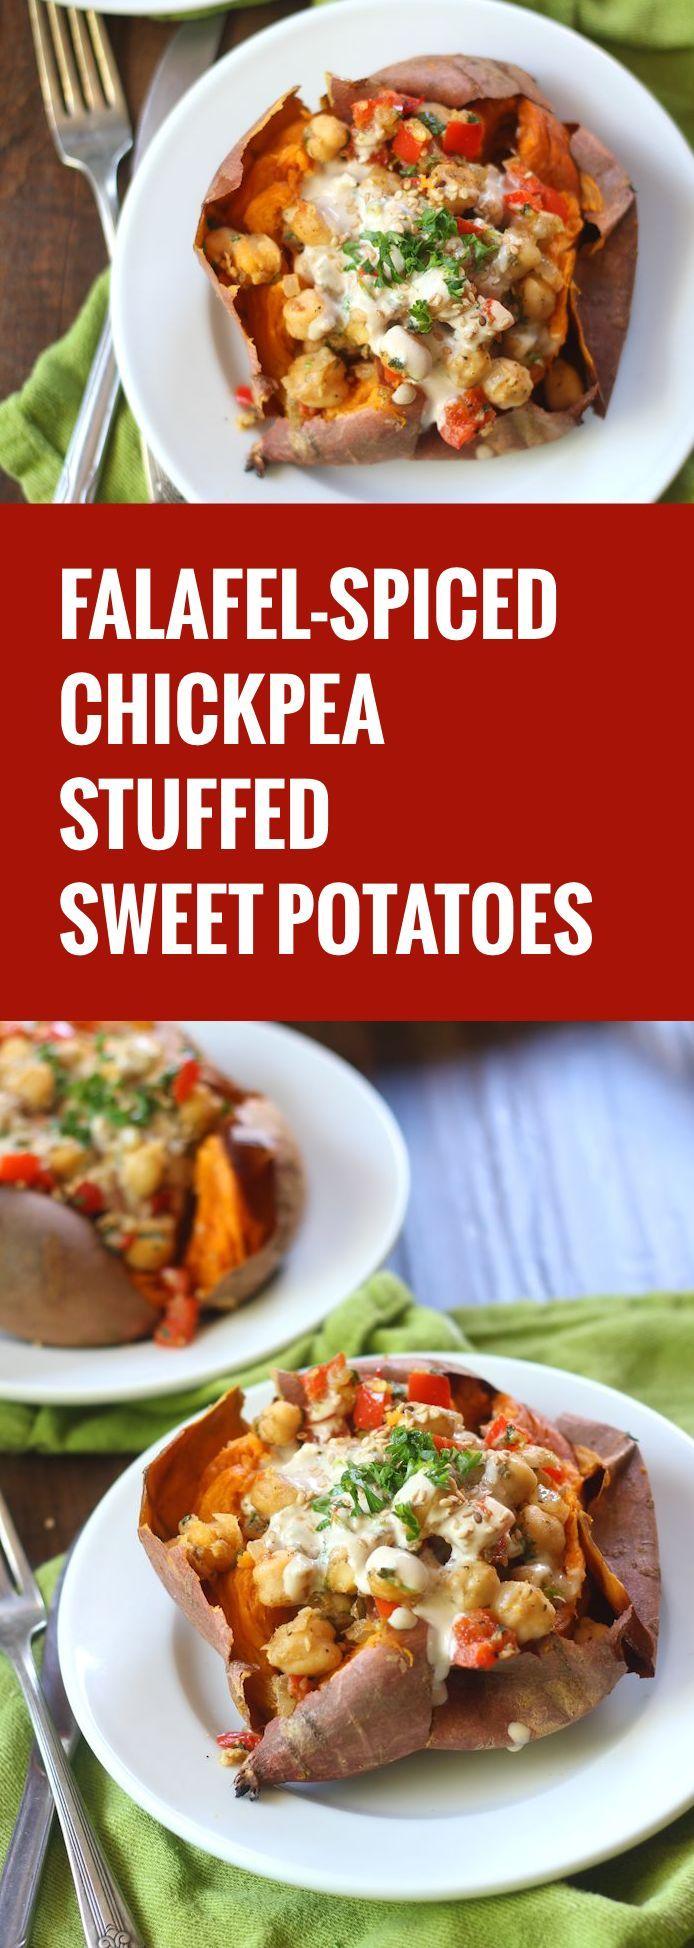 Falafel Spiced Skillet Chickpea Stuffed Sweet Potatoes | Recipe ...